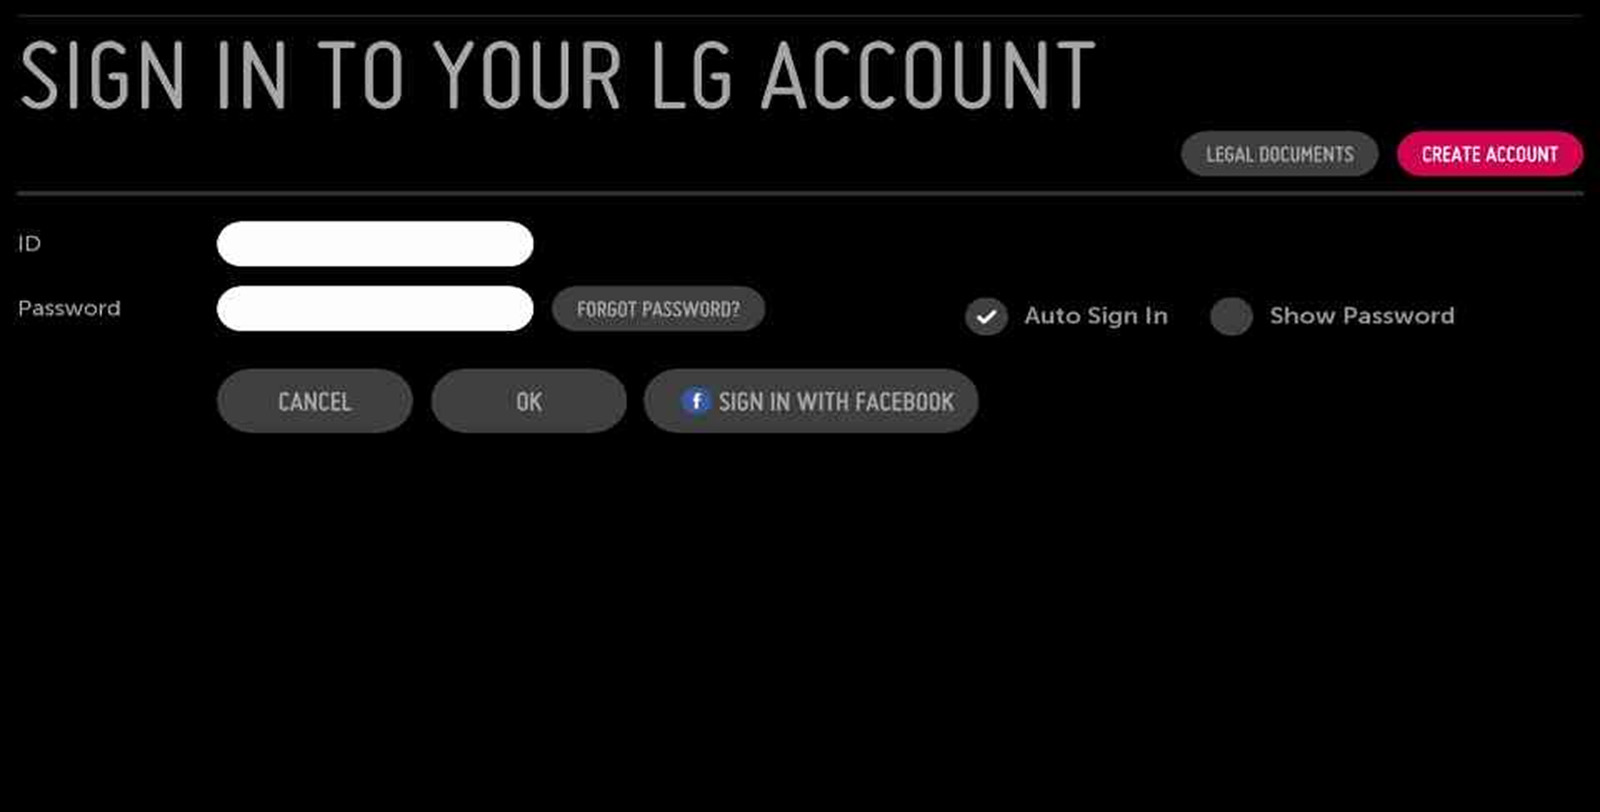 LG Smart World Account Management - Creating LG Accounts | LG USA